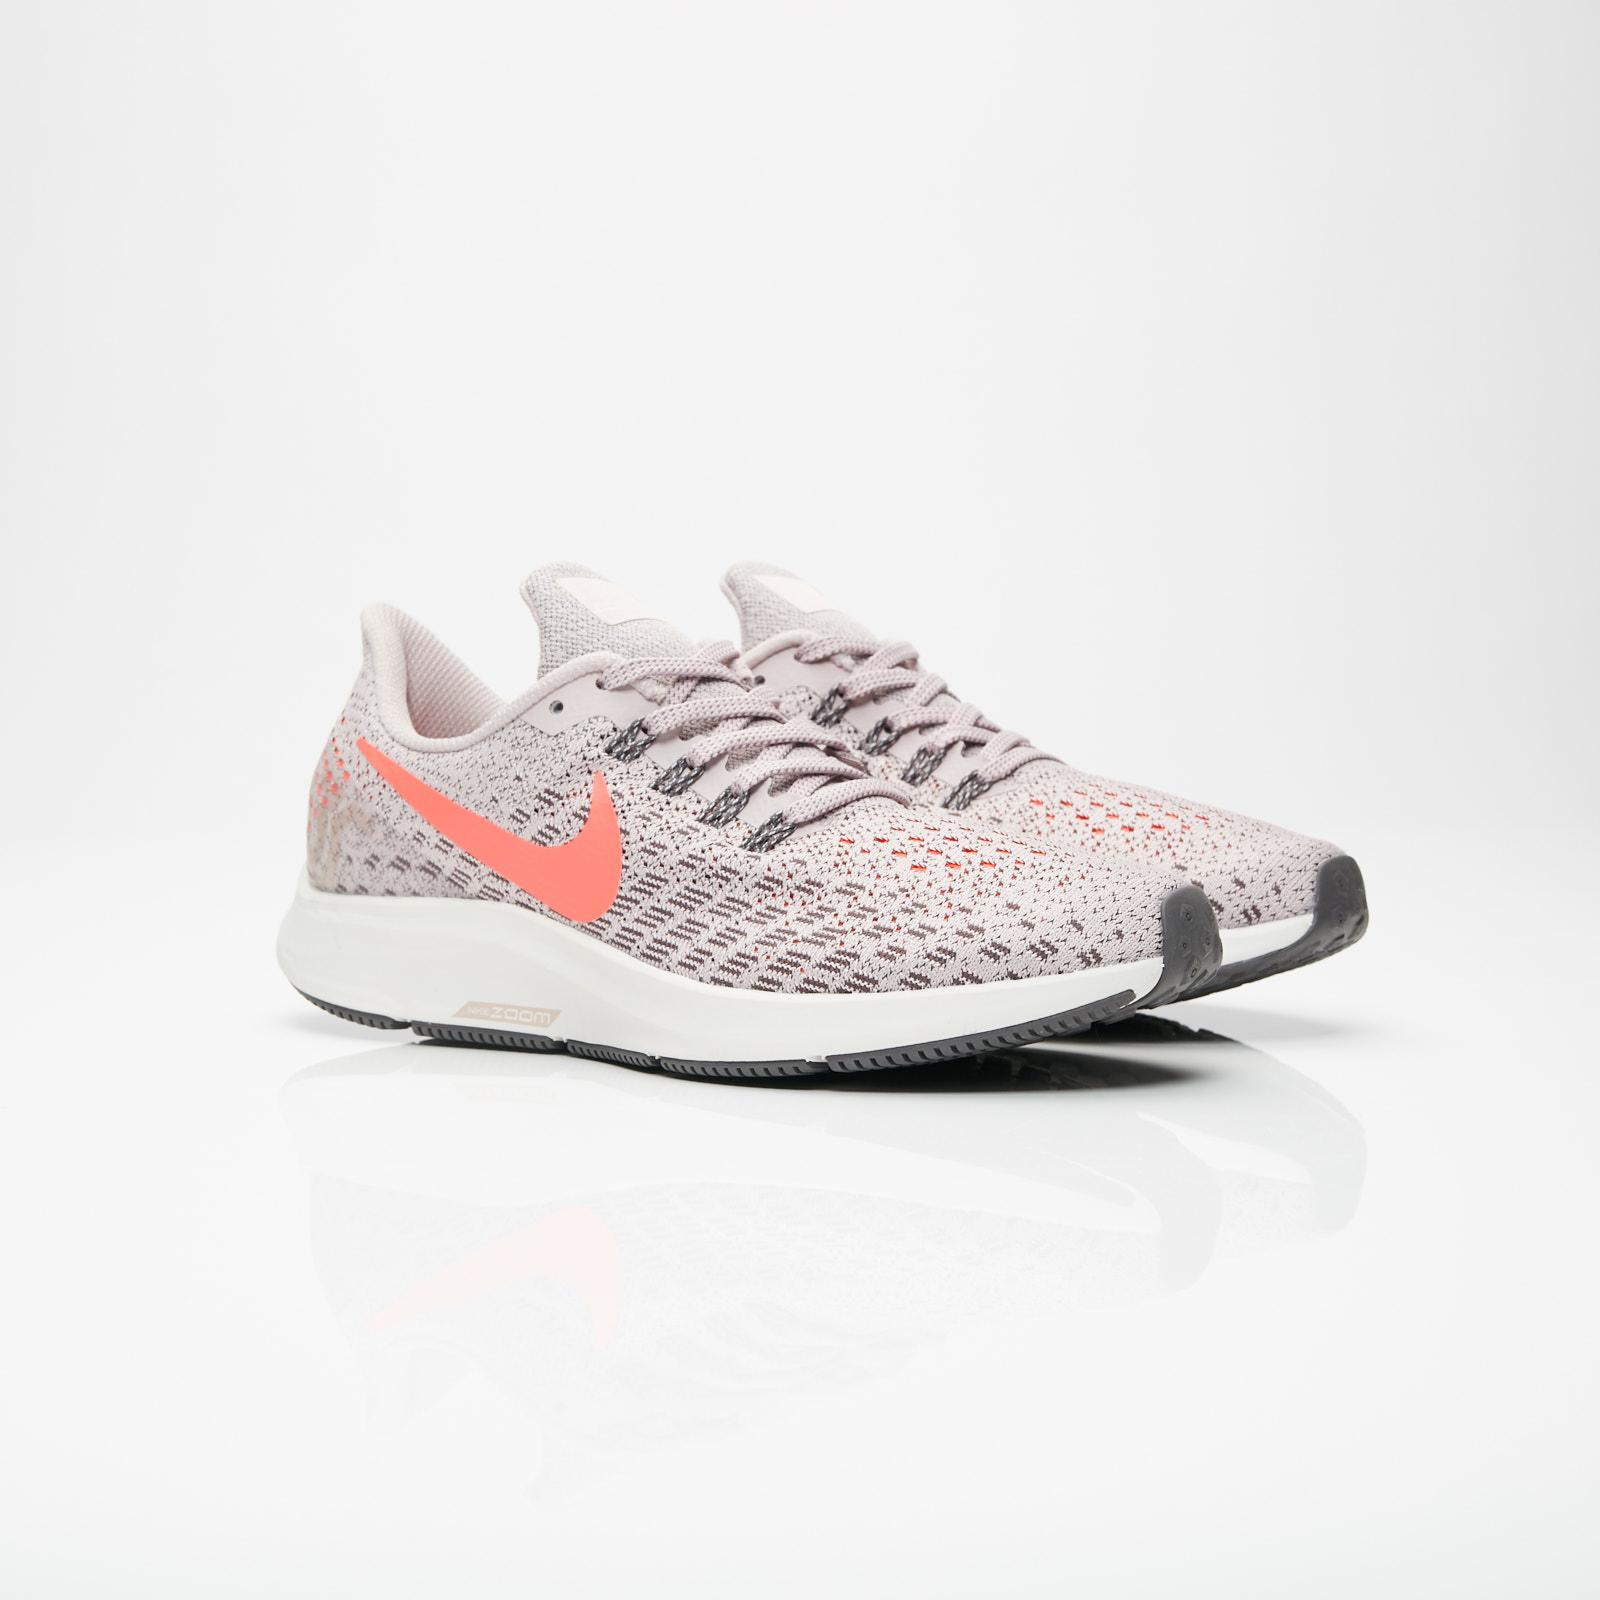 49a1f620fc82 Nike Air Zoom Pegasus 35 - 942855-602 - Sneakersnstuff